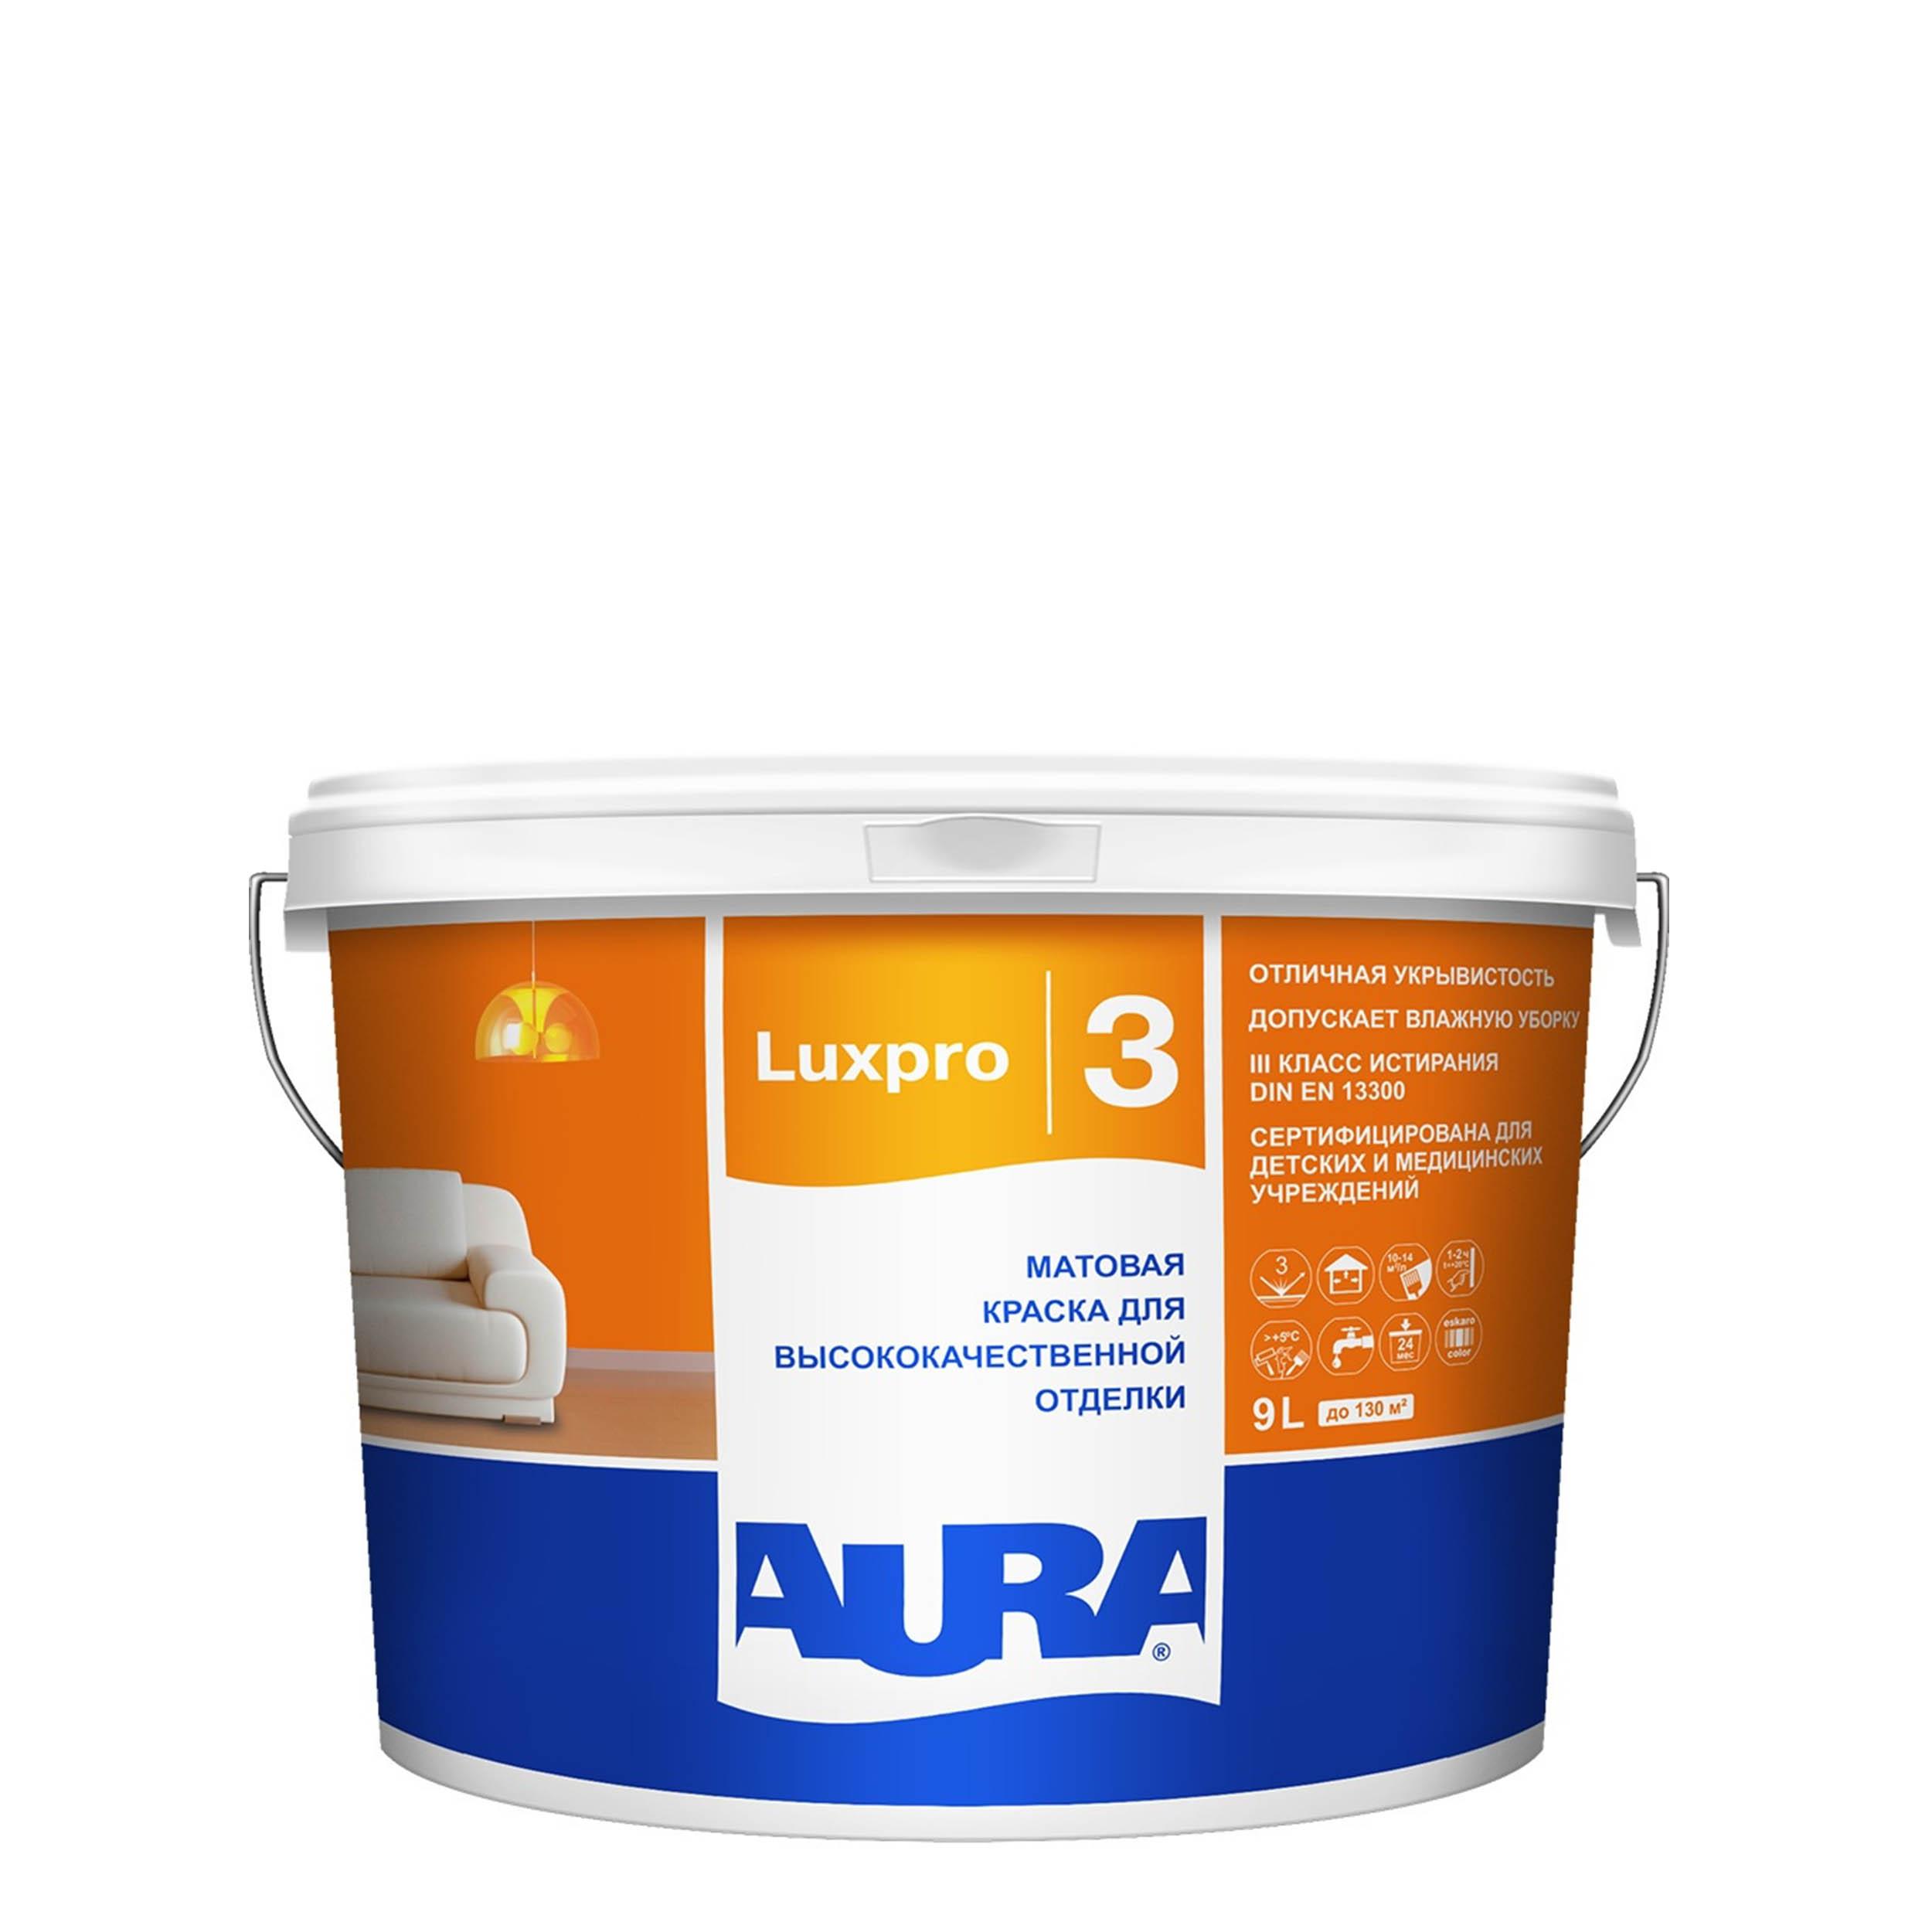 Фото 1 - Краска интерьерная, Aura LuxPRO 3, RAL 1000, 11 кг.